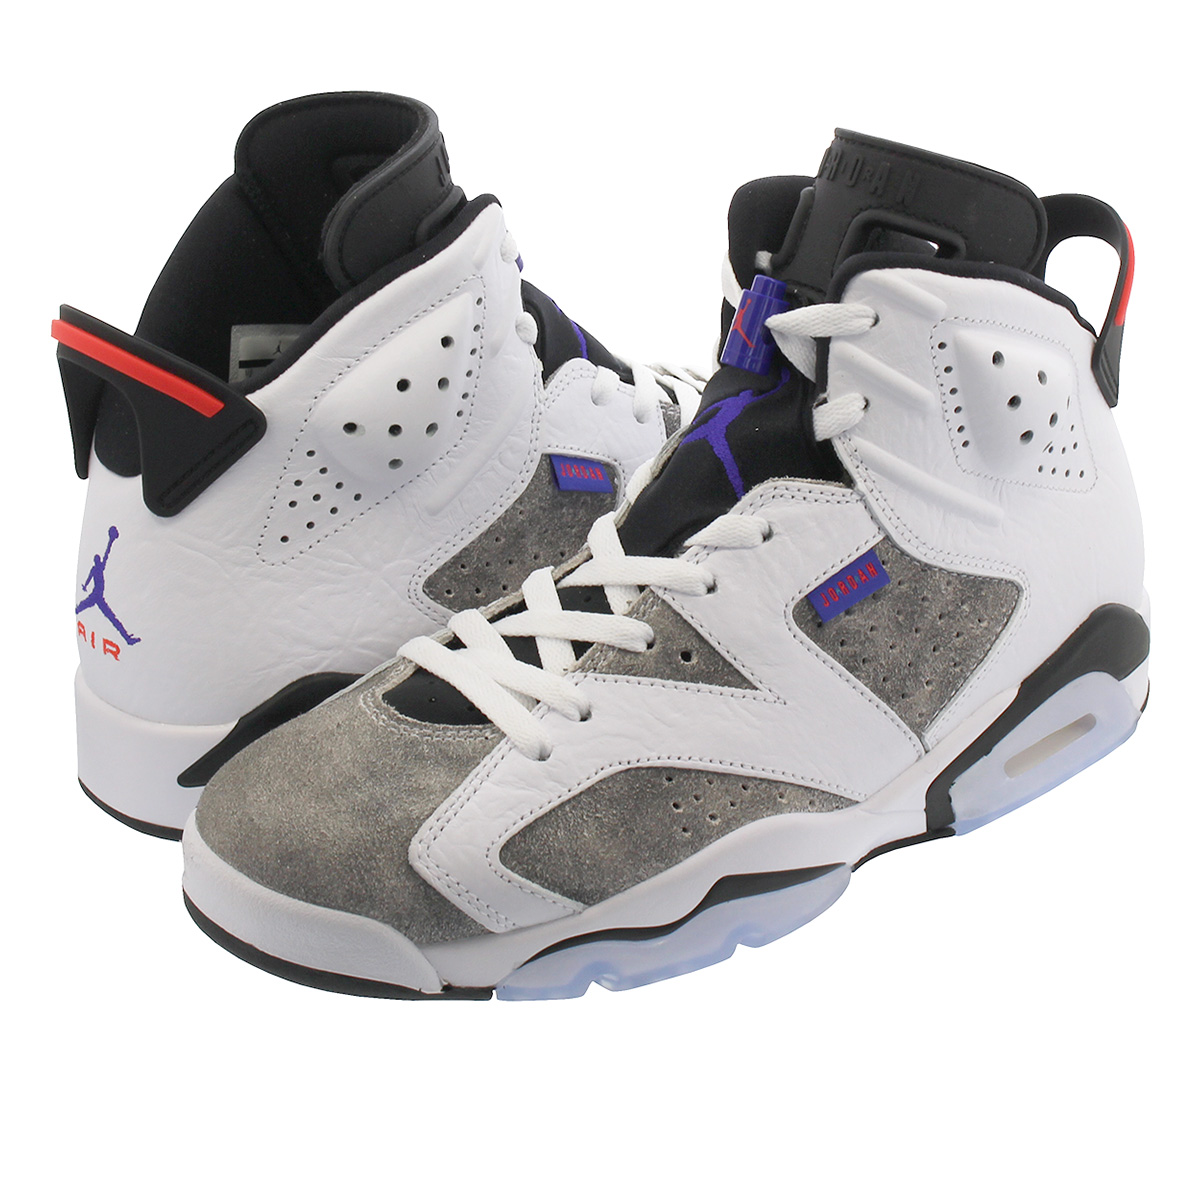 dab1e864b75 NIKE AIR JORDAN 6 RETRO Nike Air Jordan 6 nostalgic WHITE/BLACK/INFRARED 23  ...